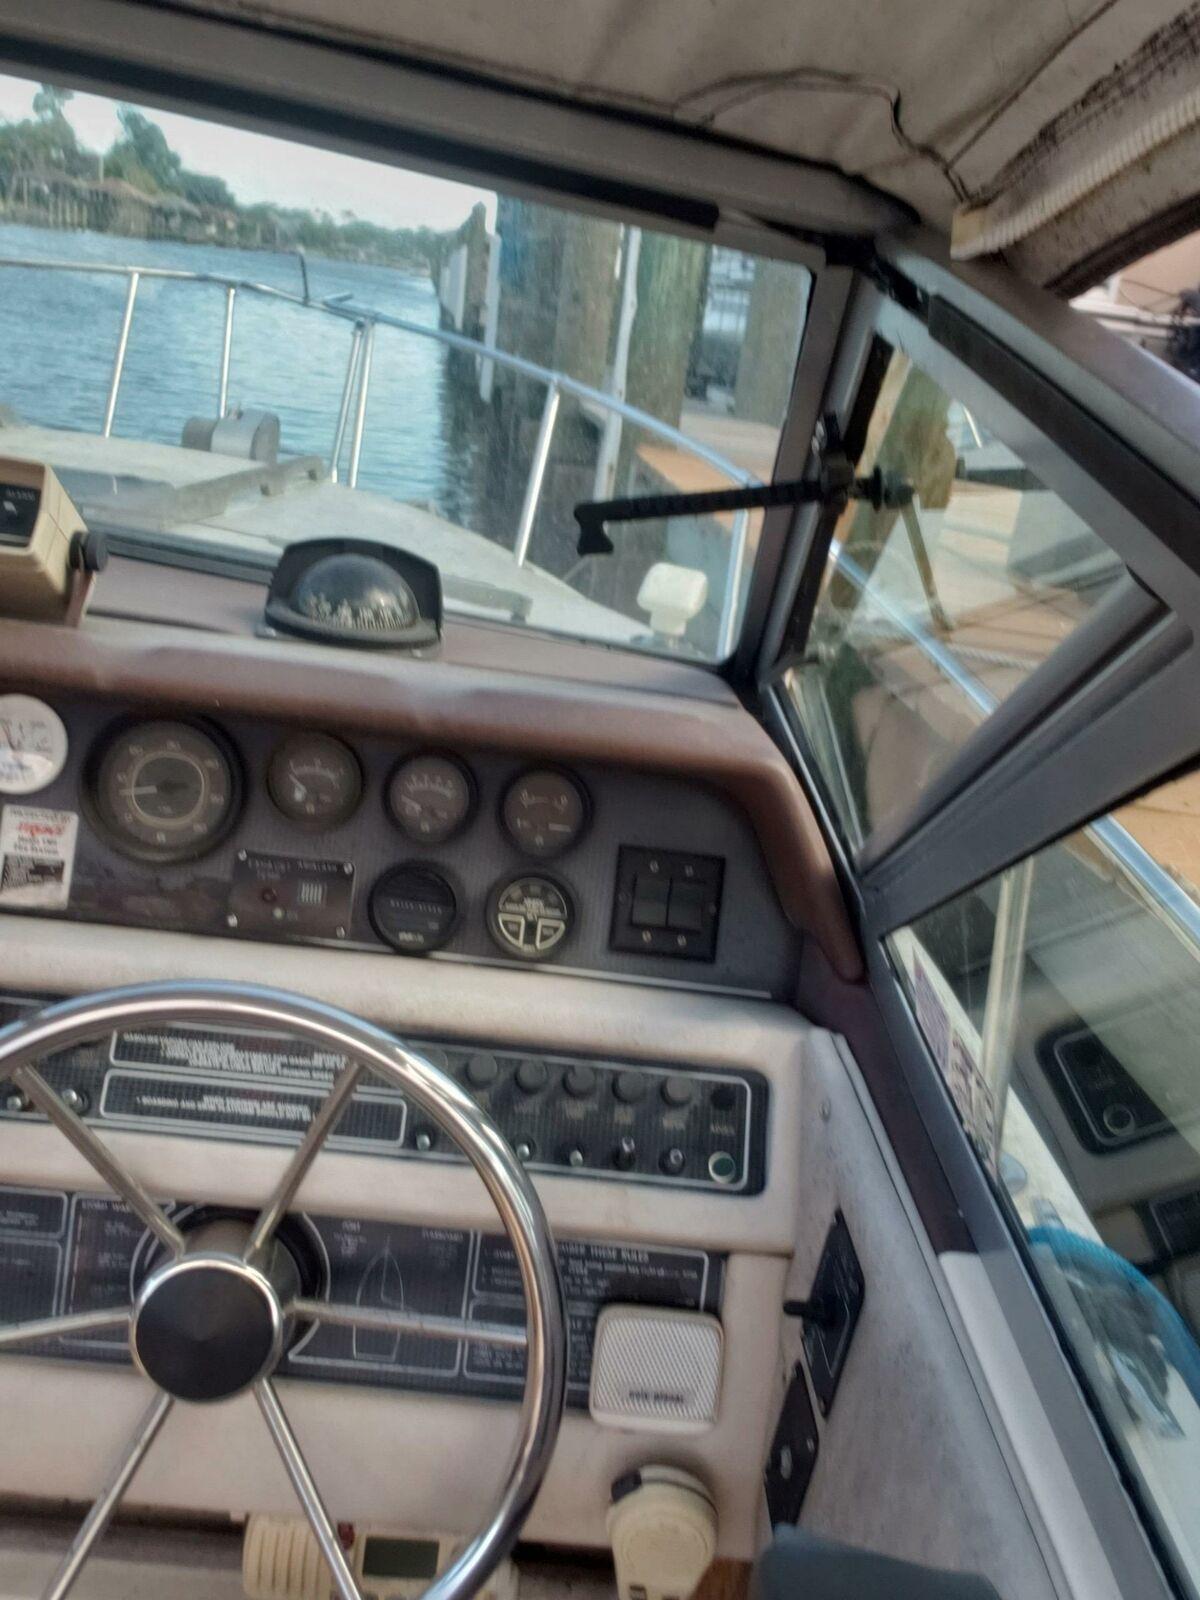 1986 SEA RAY BOAT 23' Located in PALM COAST, FLORIDA - NO TRAILER